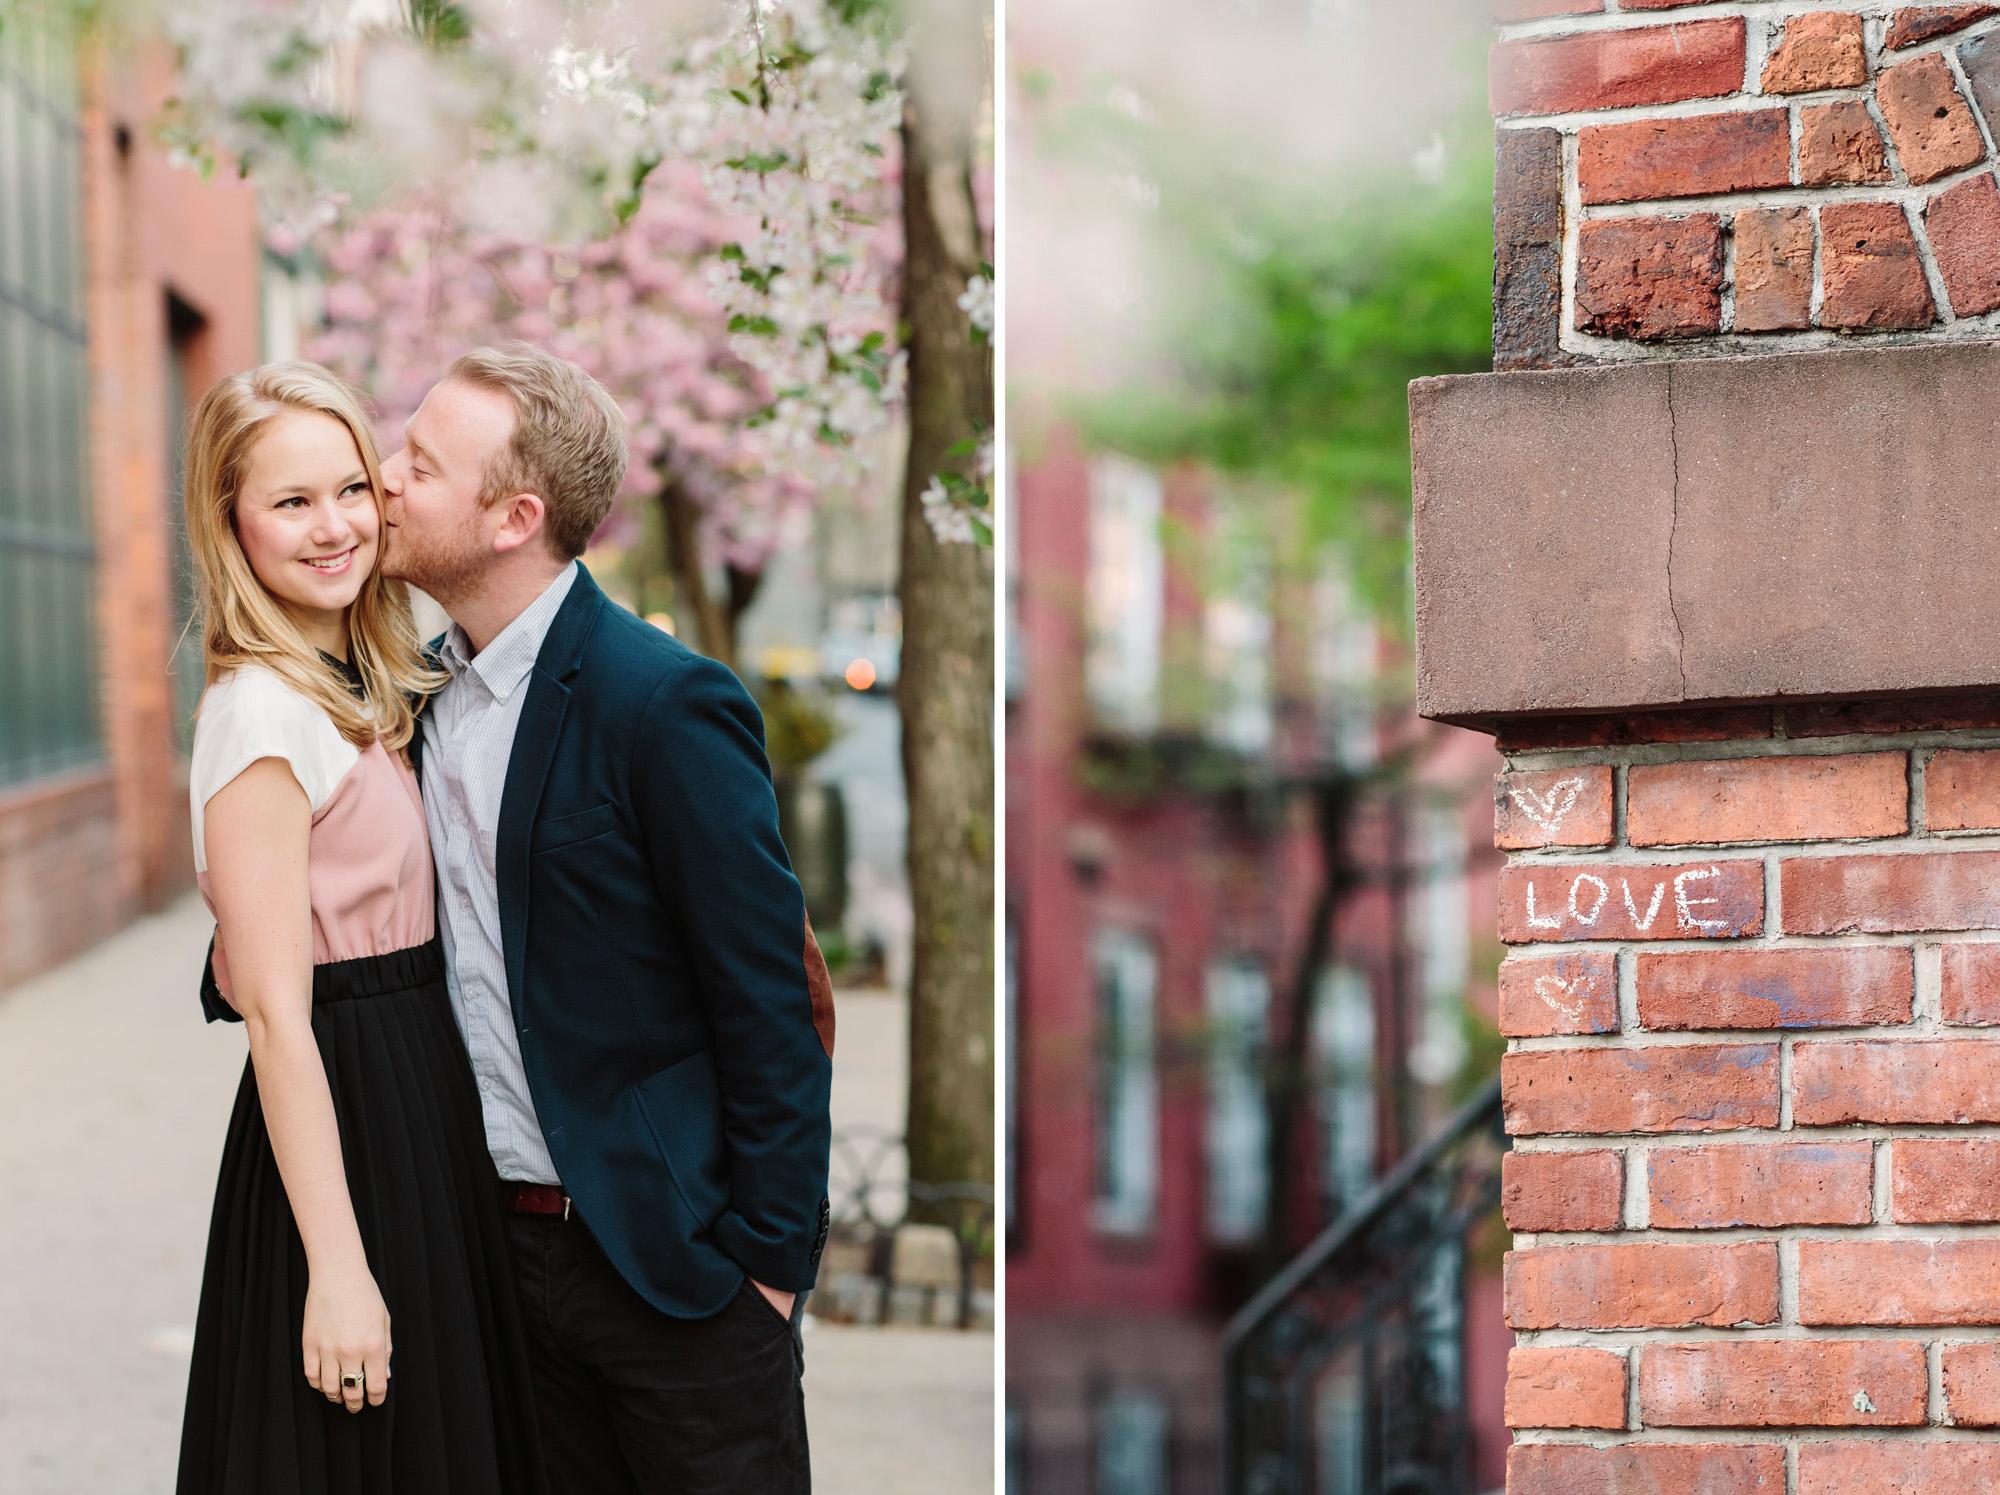 04_Kase_Paul_West_Village_The_Highline_NYC_Engagement_Tanya_Salazar_Photography.jpg